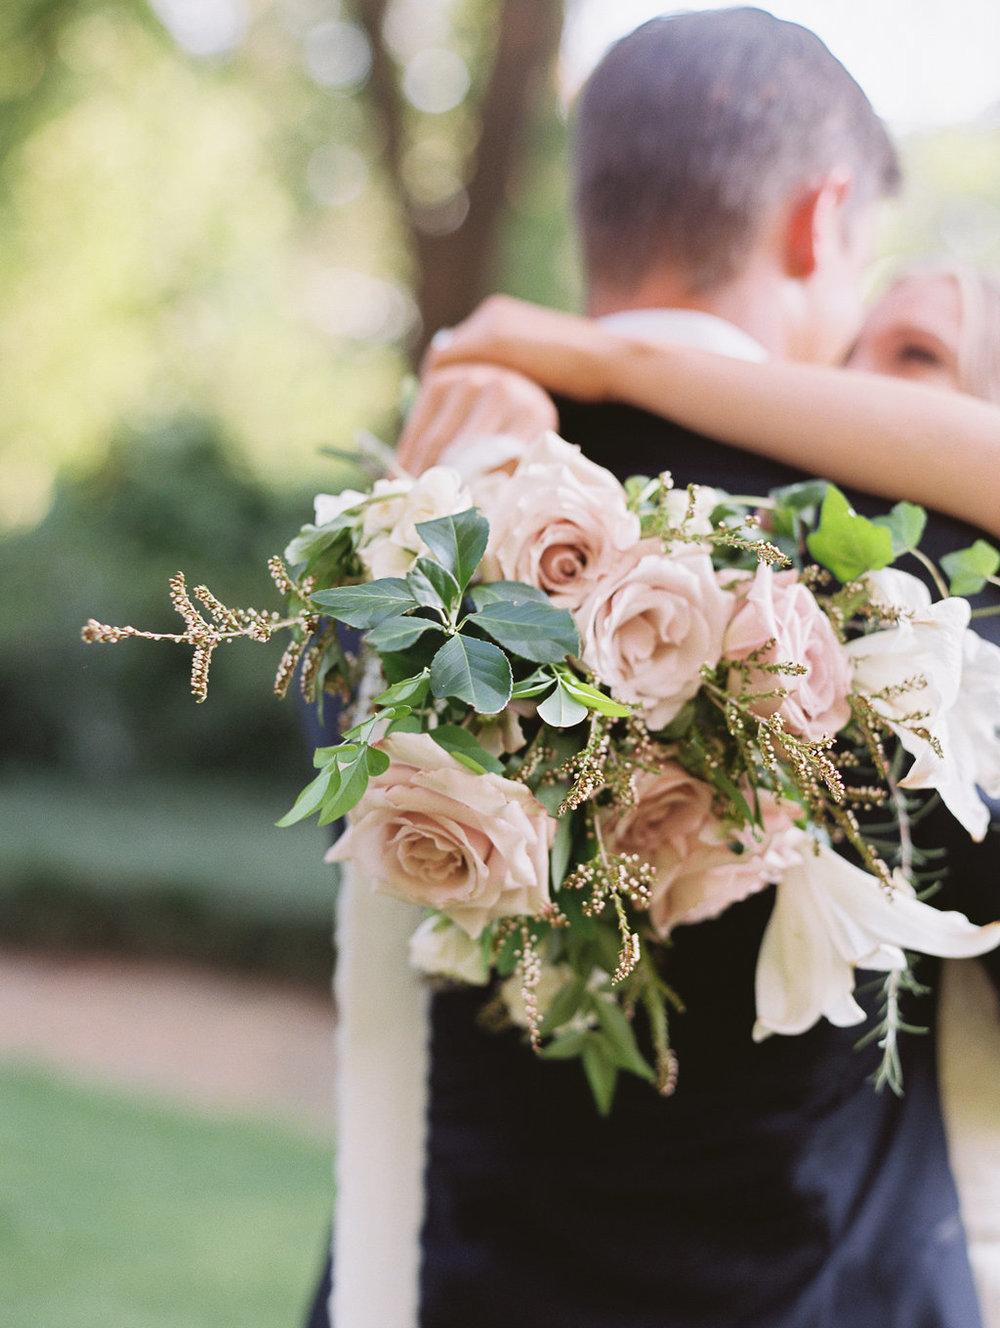 athens-founders-memorial-garden-wedding-photography-hannah-forsberg-atlanta-wedding-photographer-29.jpg